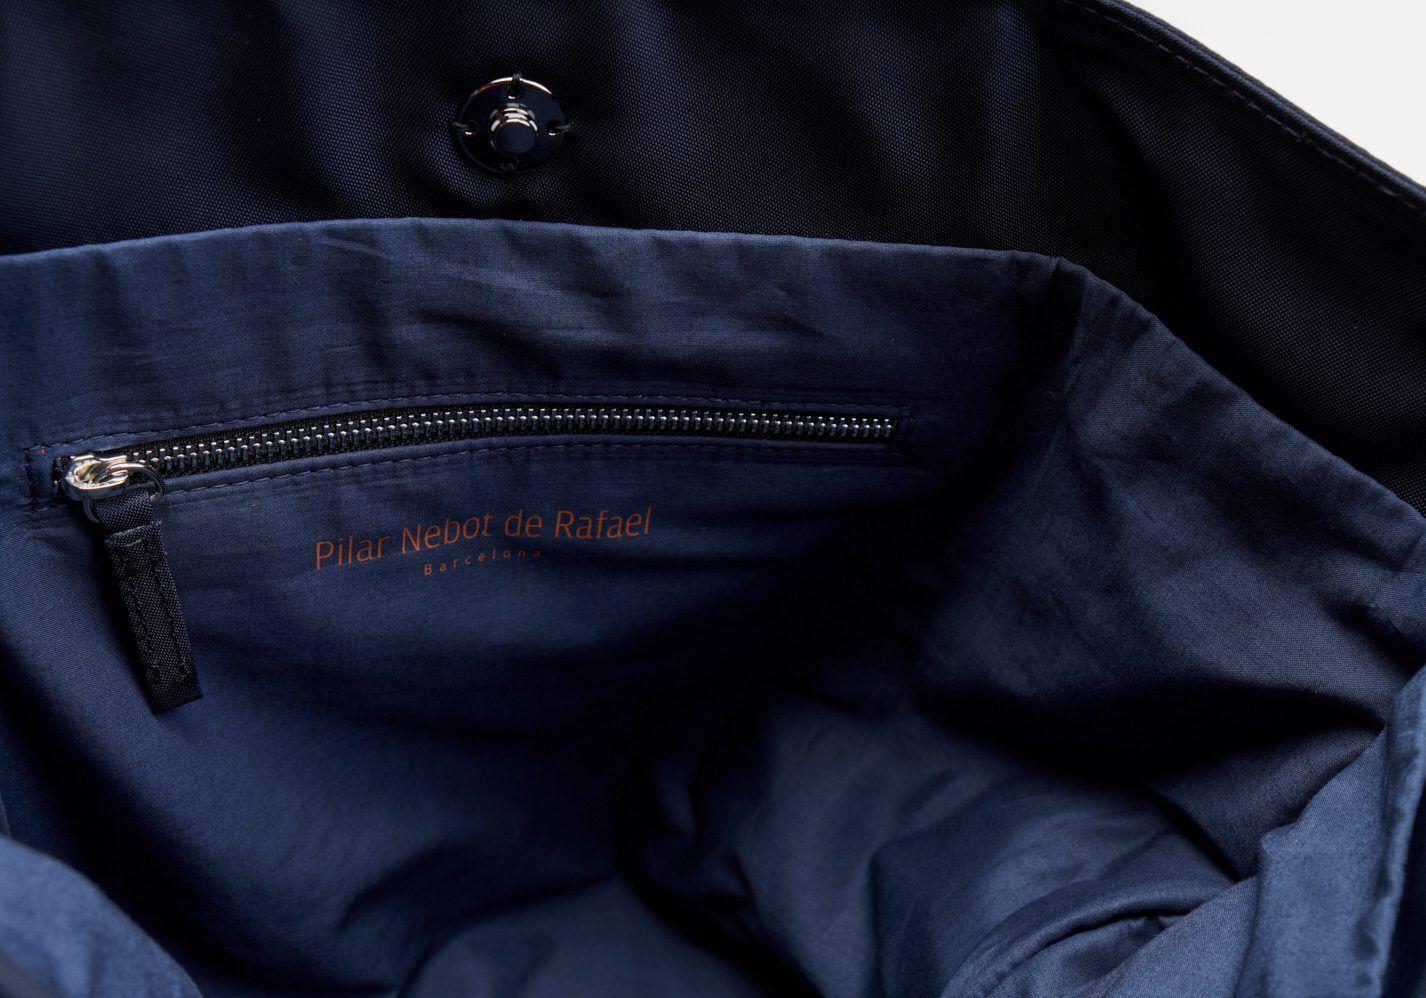 Bolso bandolera en color marino con cinta de rayas marino y plateado - Detalle modelo Wagner en color azul marino